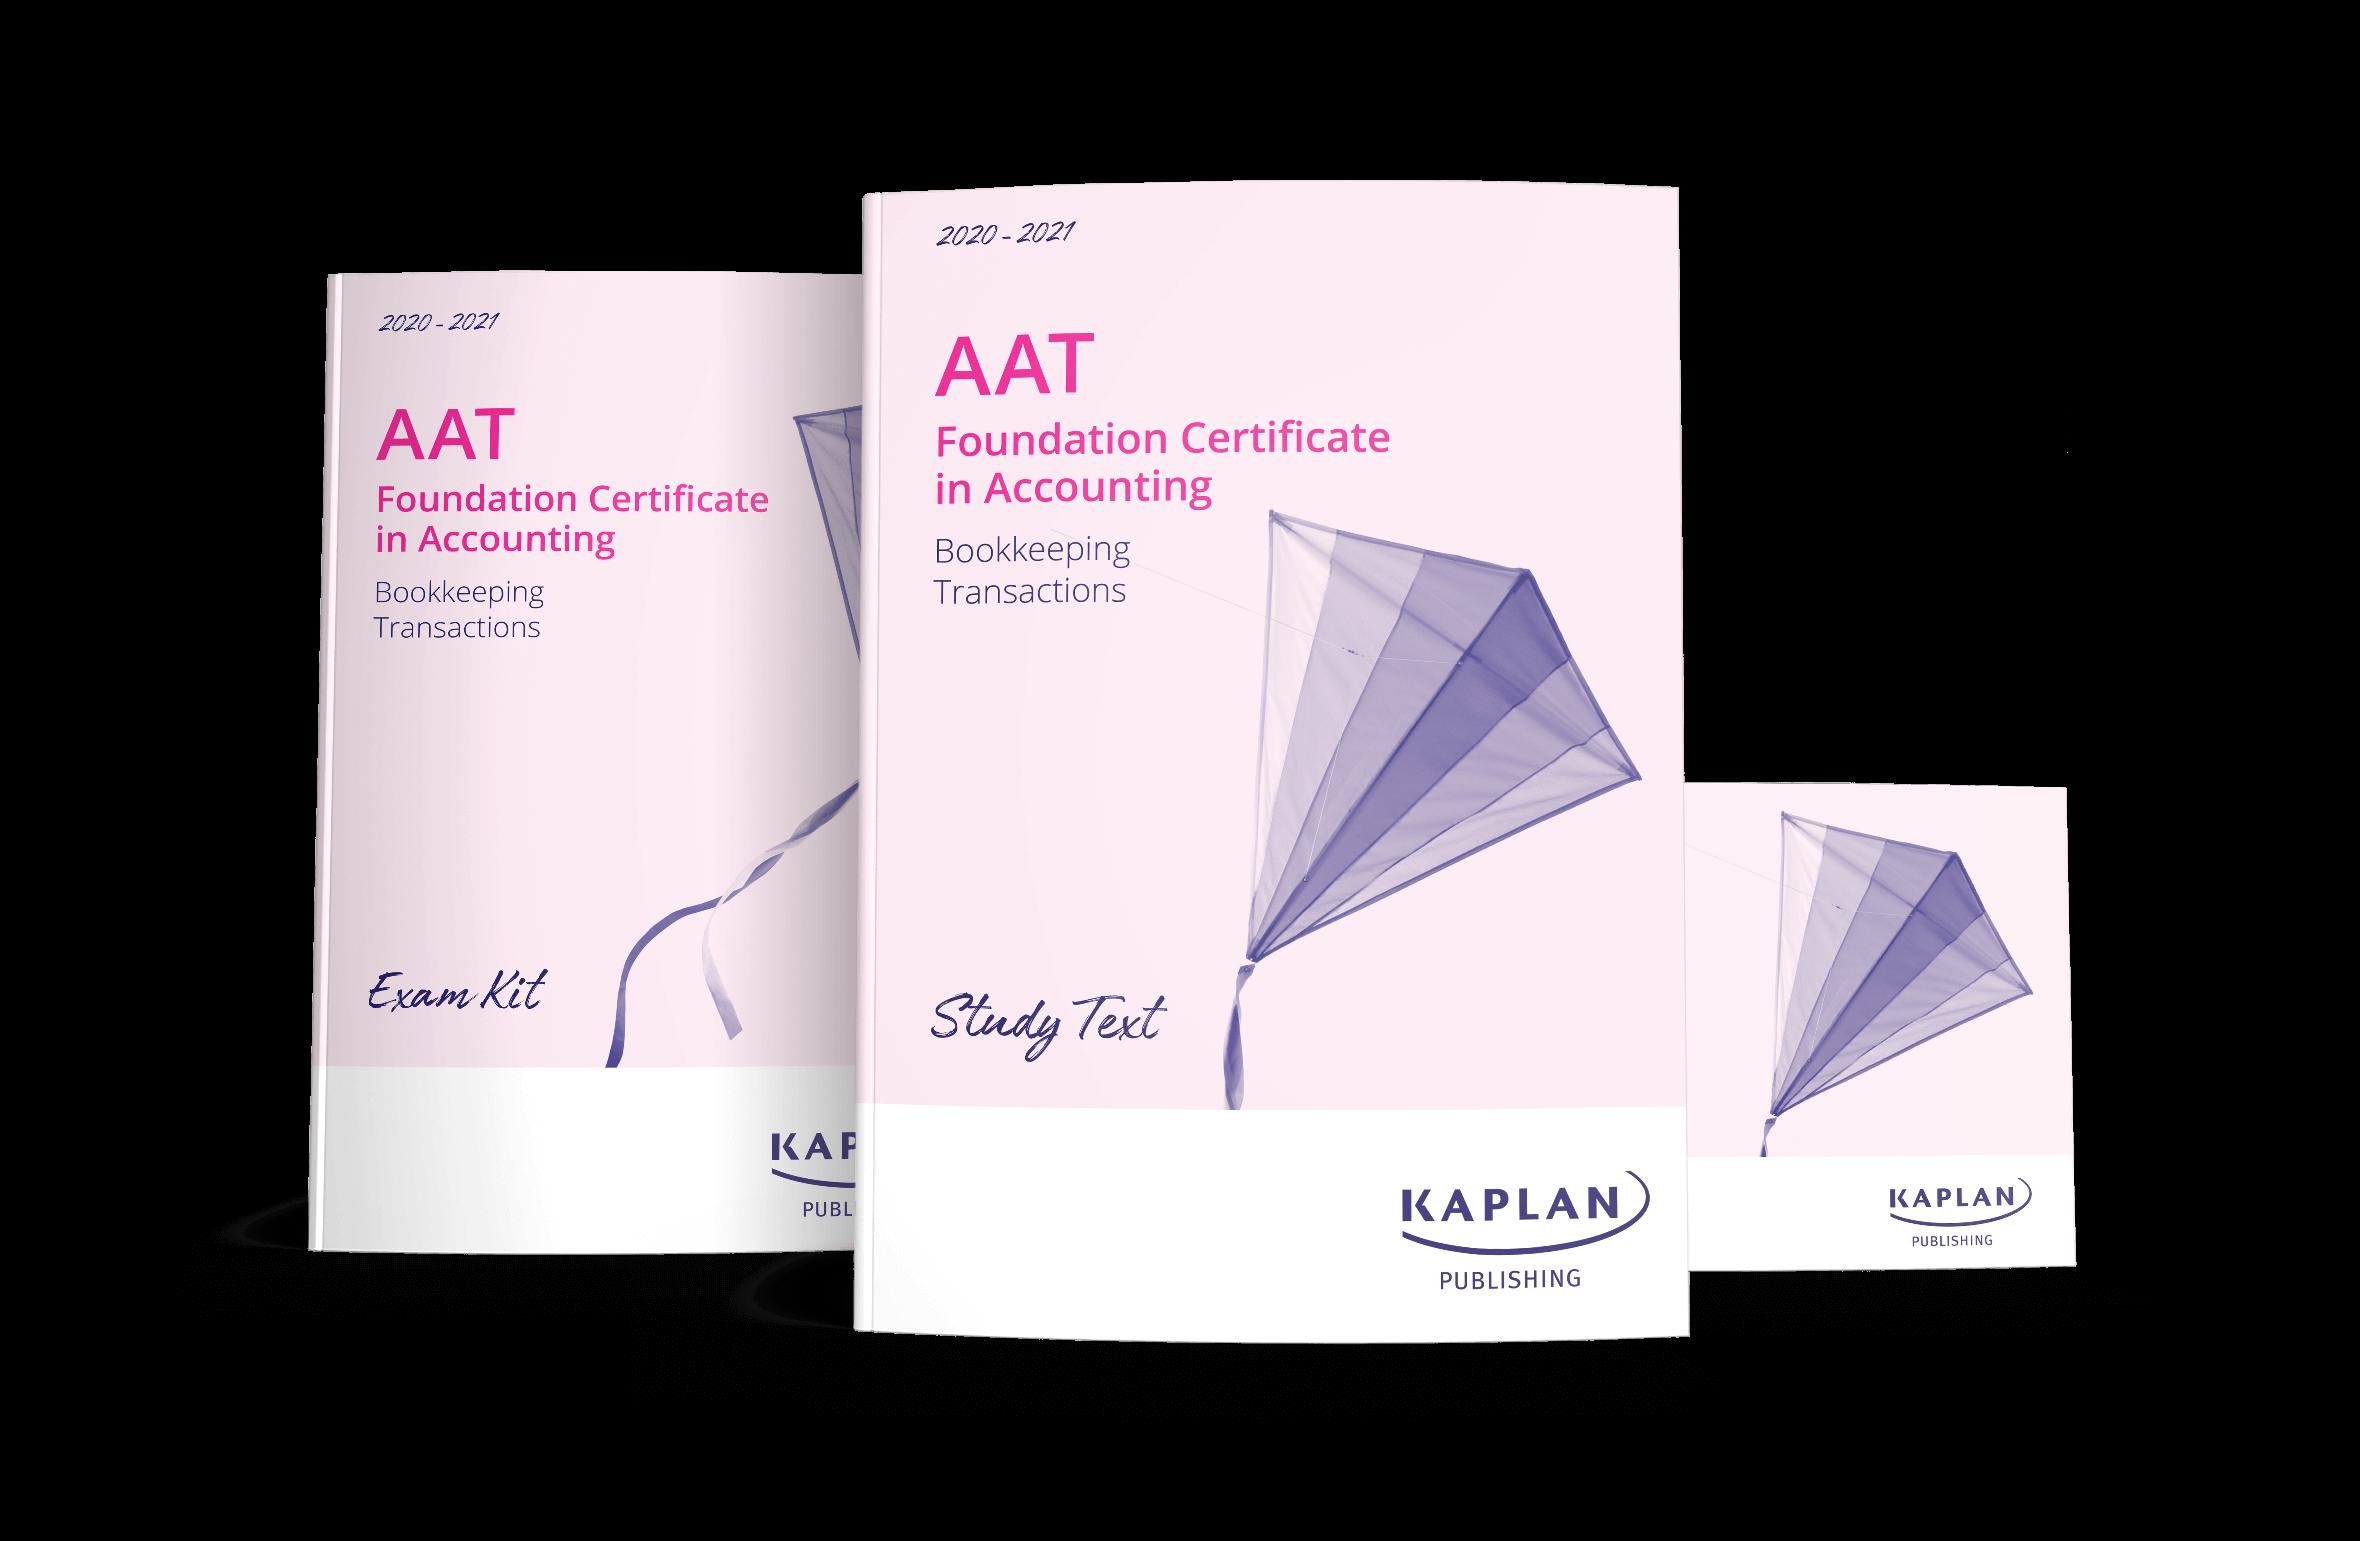 AAT Foundation Bookkeeping Transactions | Kaplan Publishing